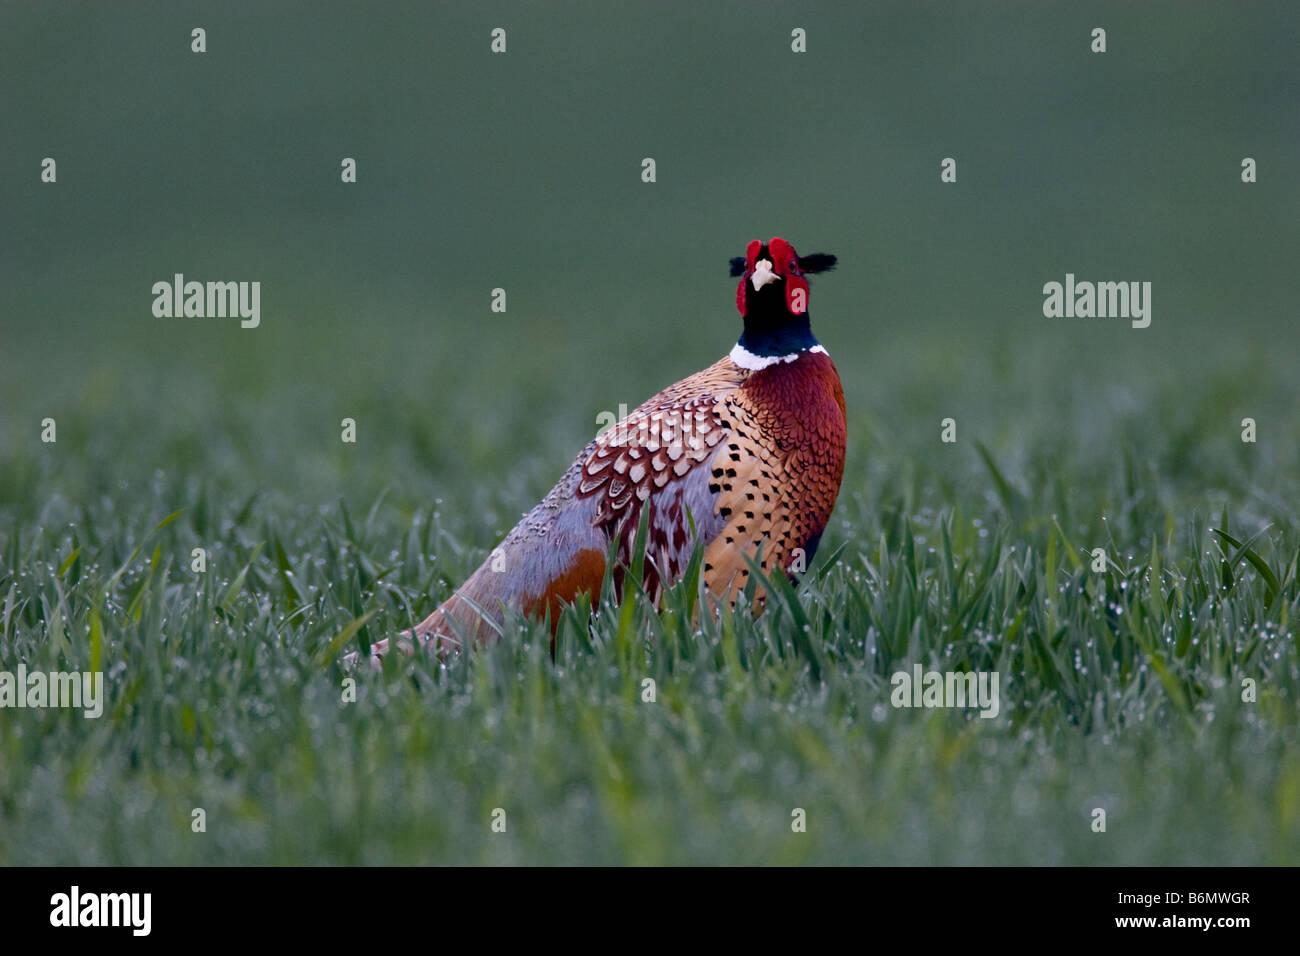 Pheasant Phasianus colchicus (Phasianidae) - Stock Image